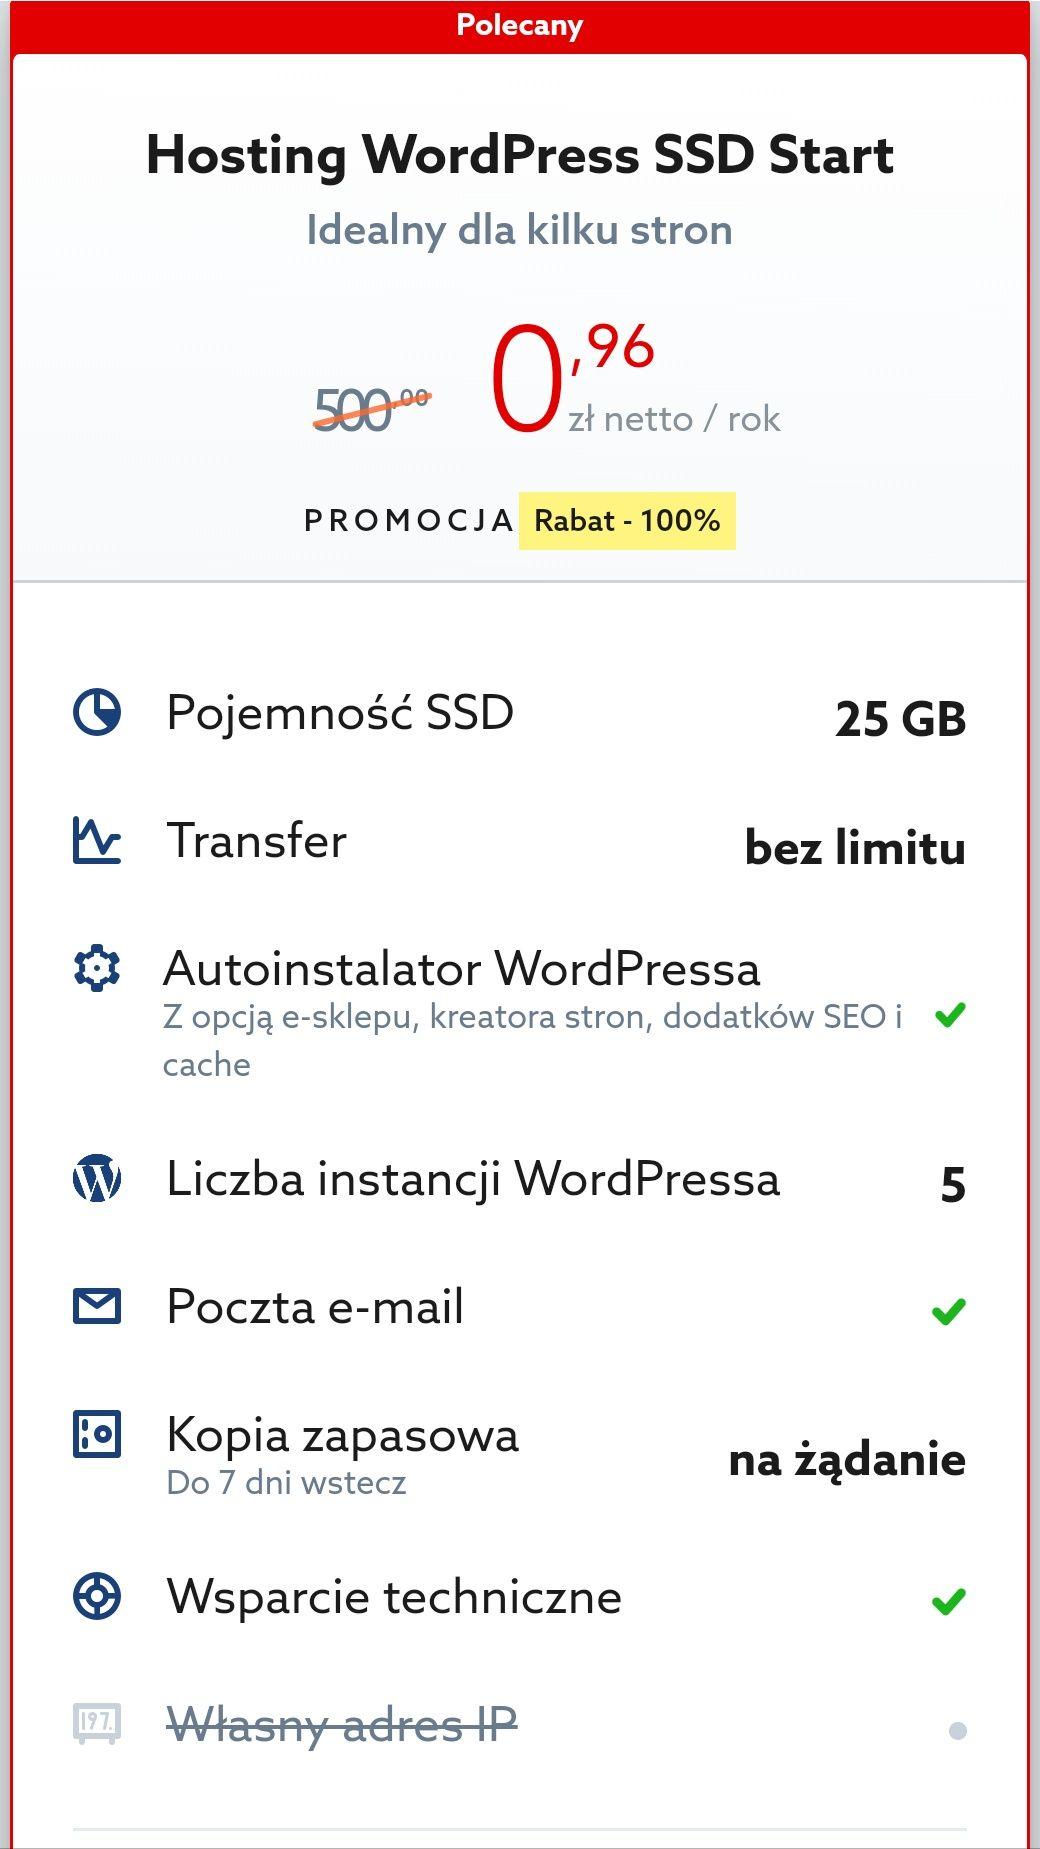 Hosting Wordpress SSD na home.pl